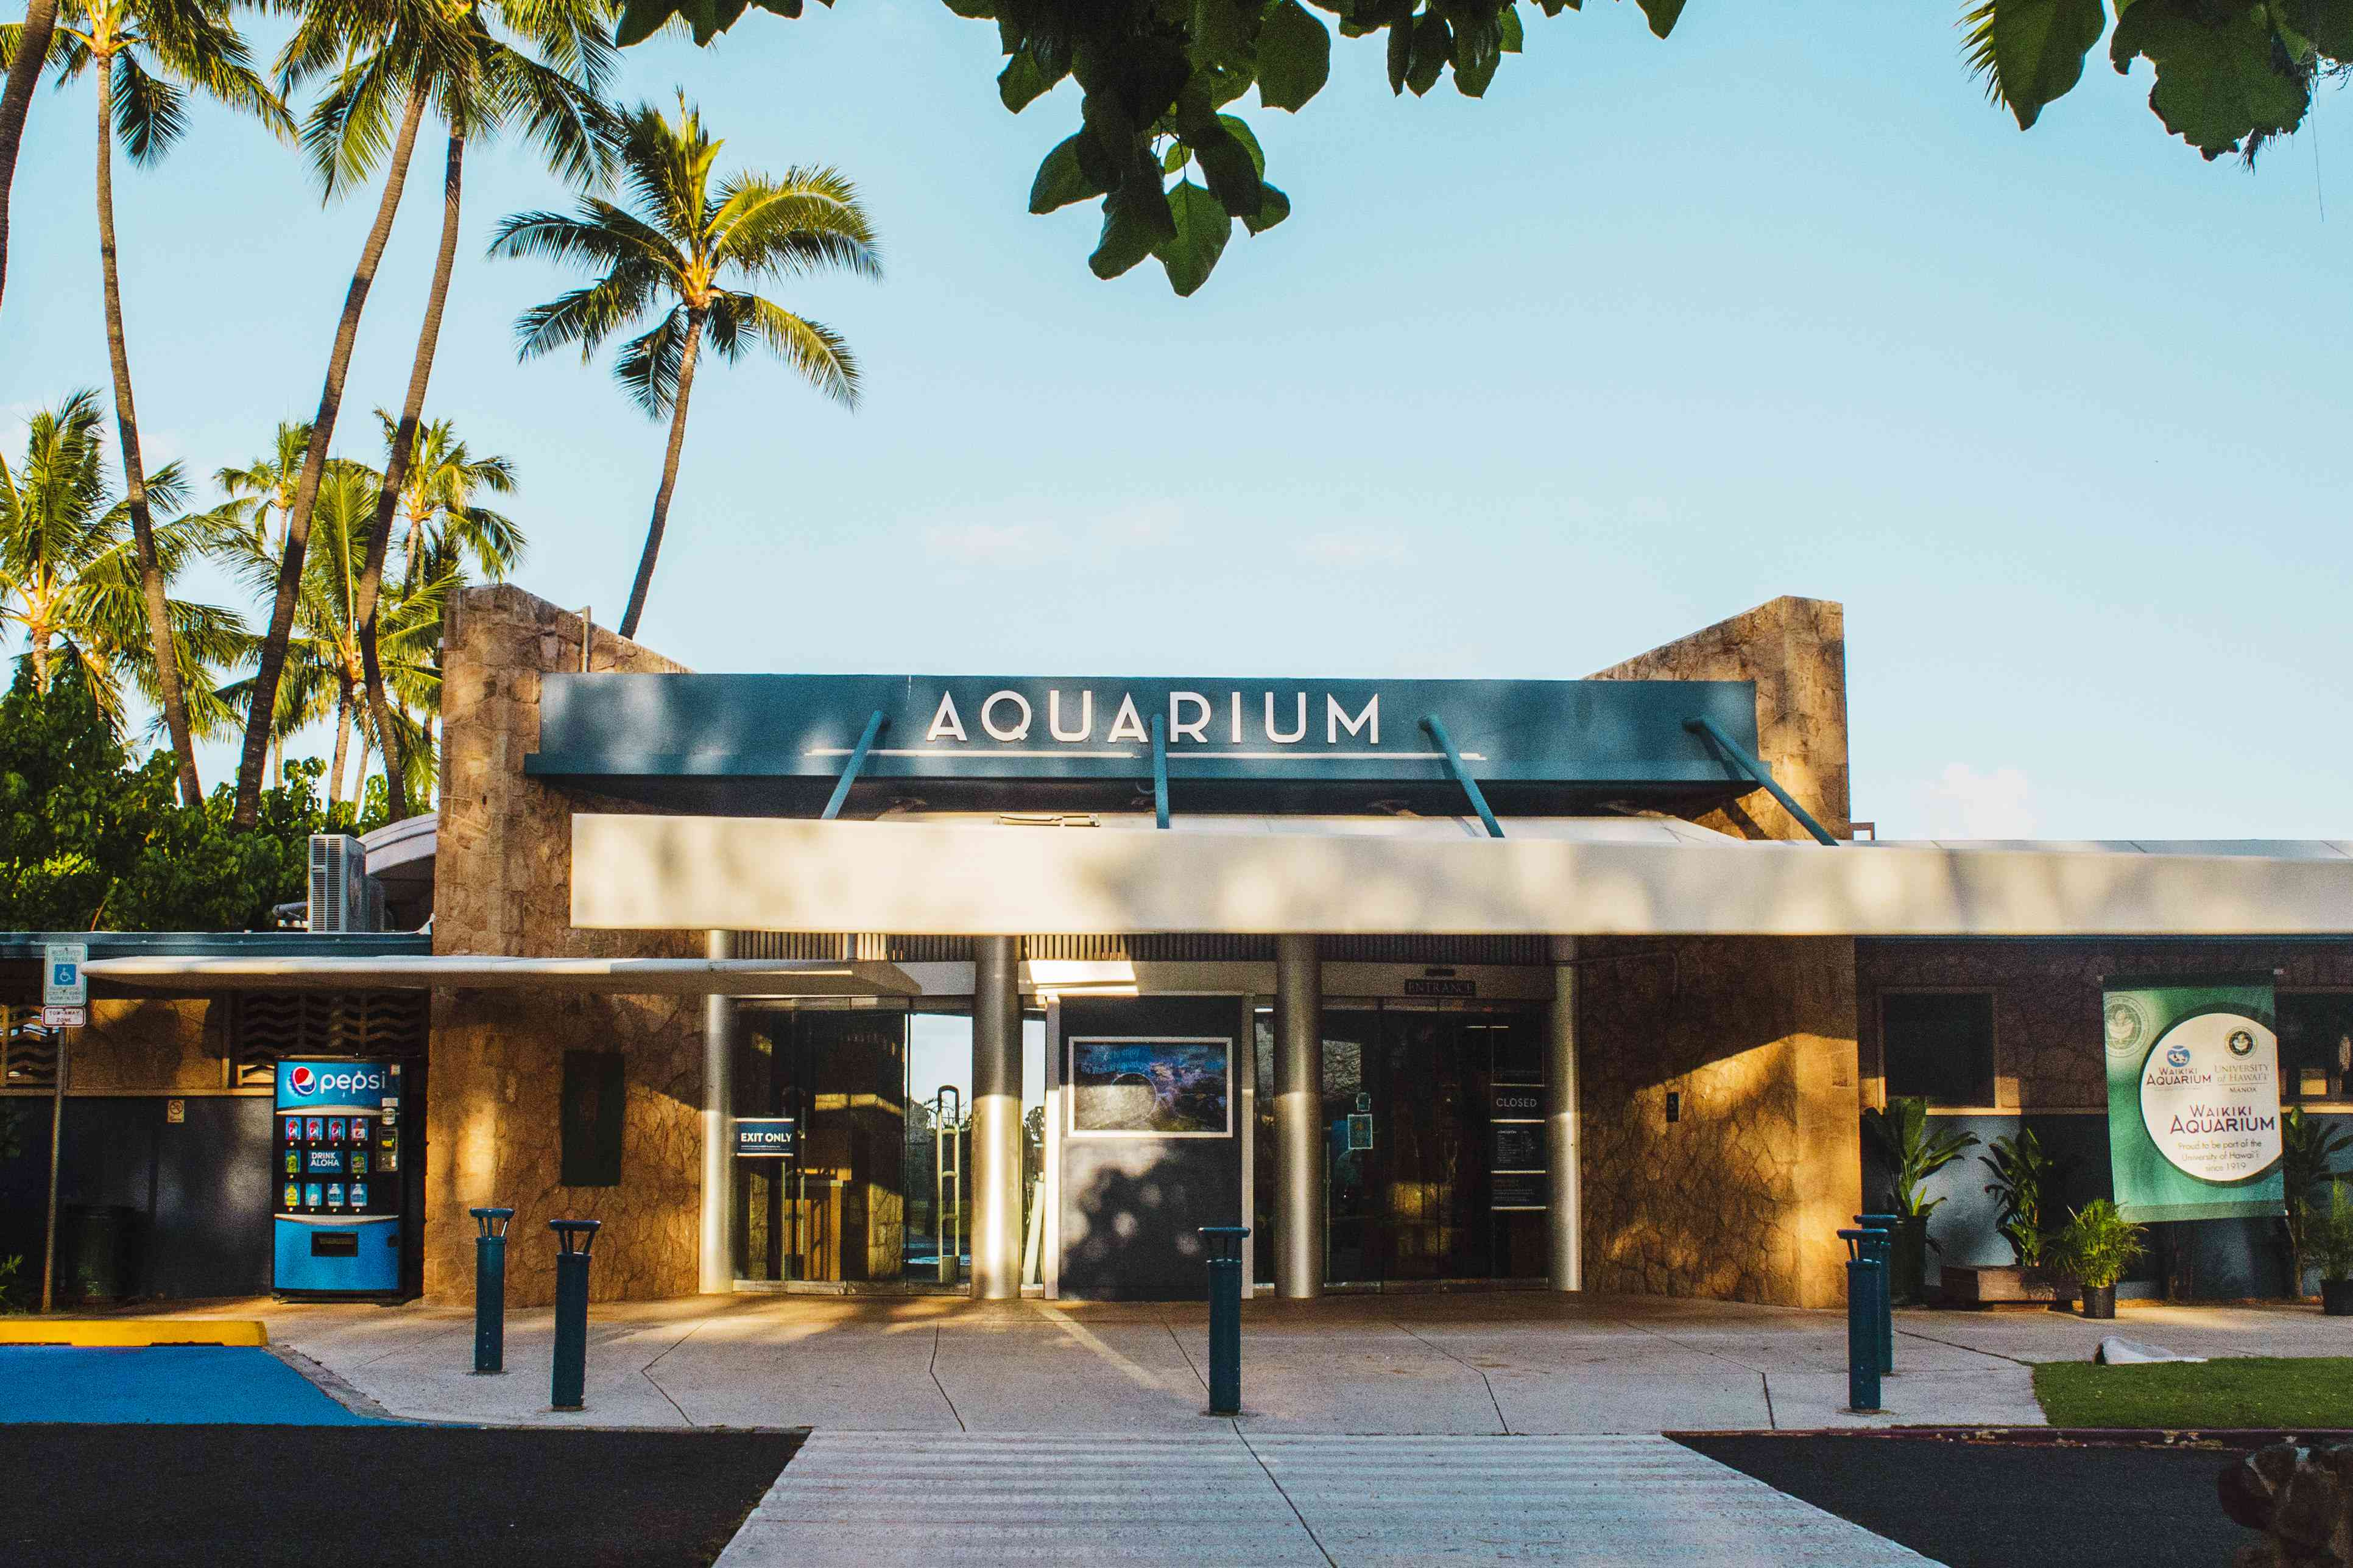 Entrance to the Waikii Aquarium